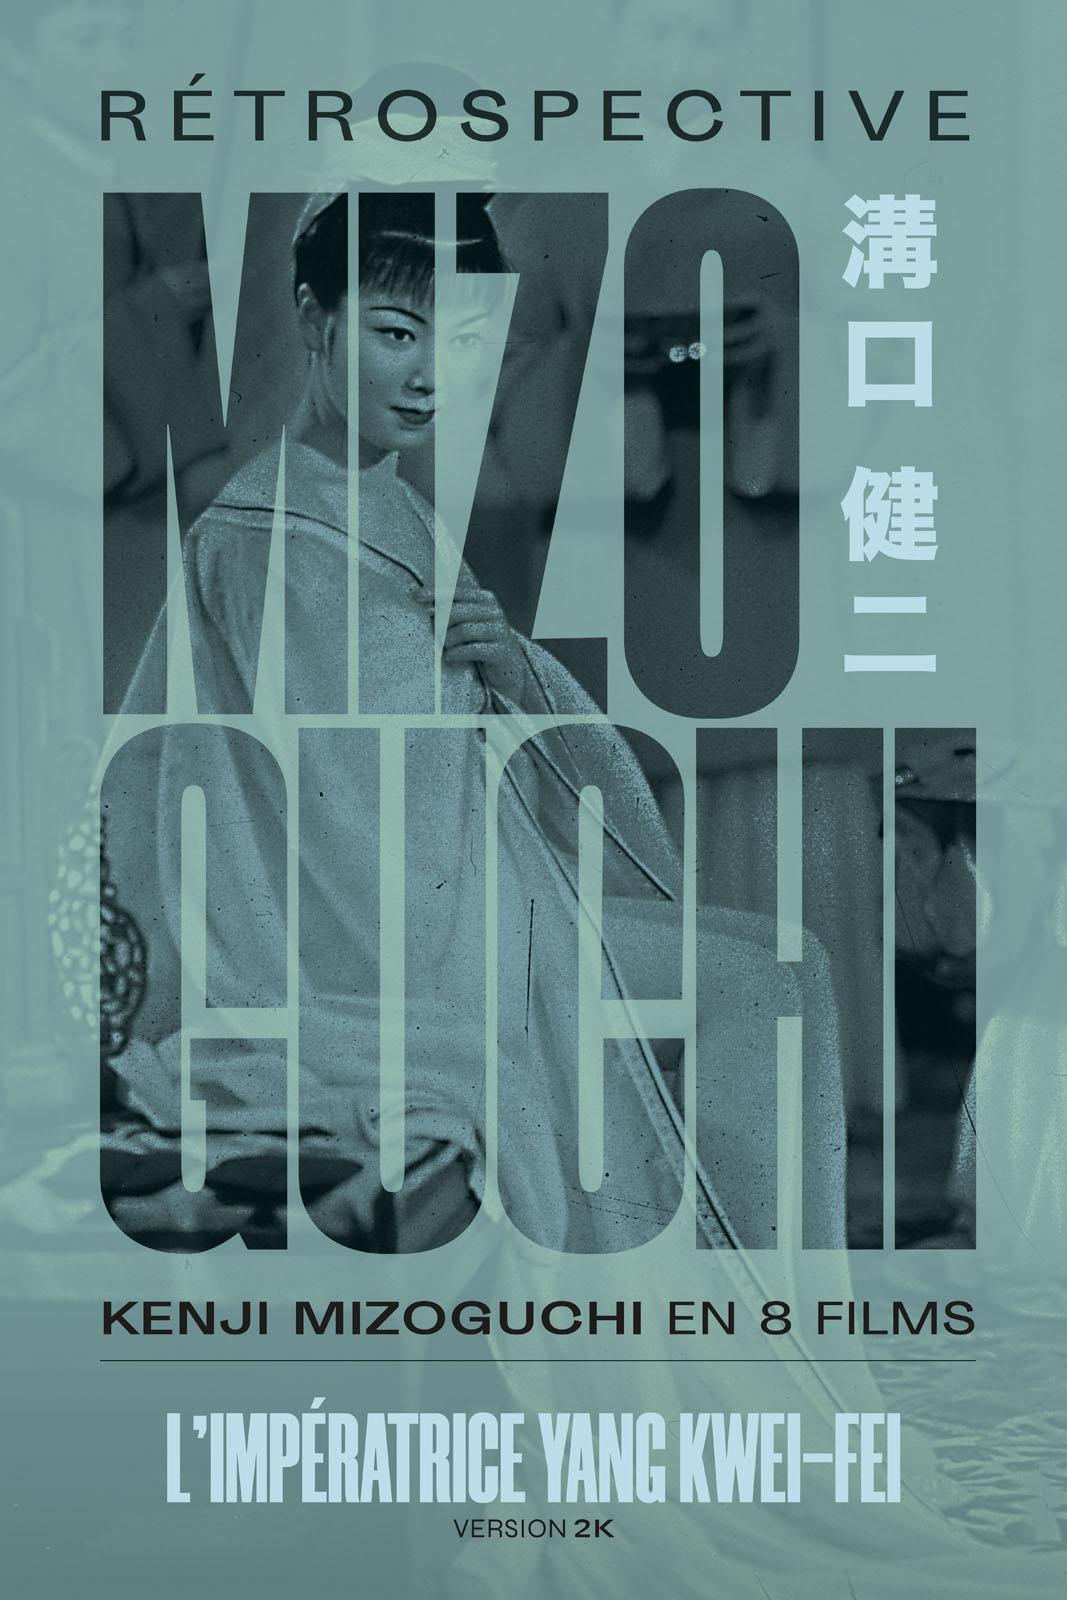 Image du film L'Impératrice Yang Kwei-Fei